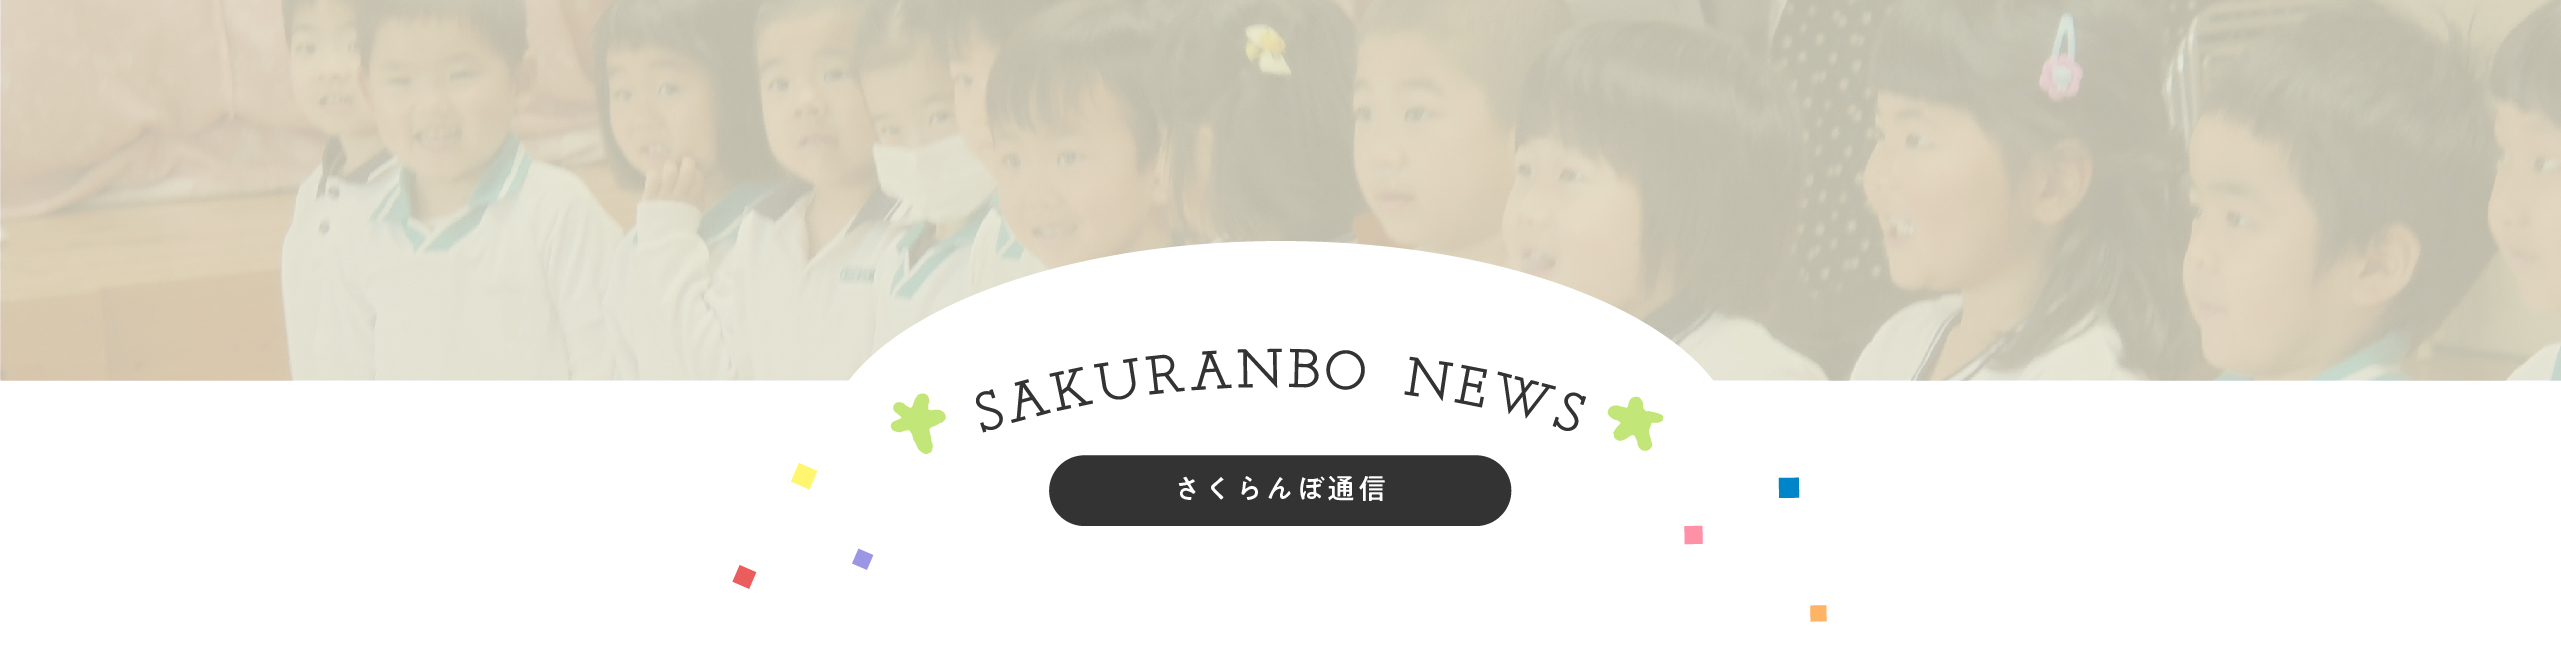 SAKURANBO NEWS -さくらんぼ通信-